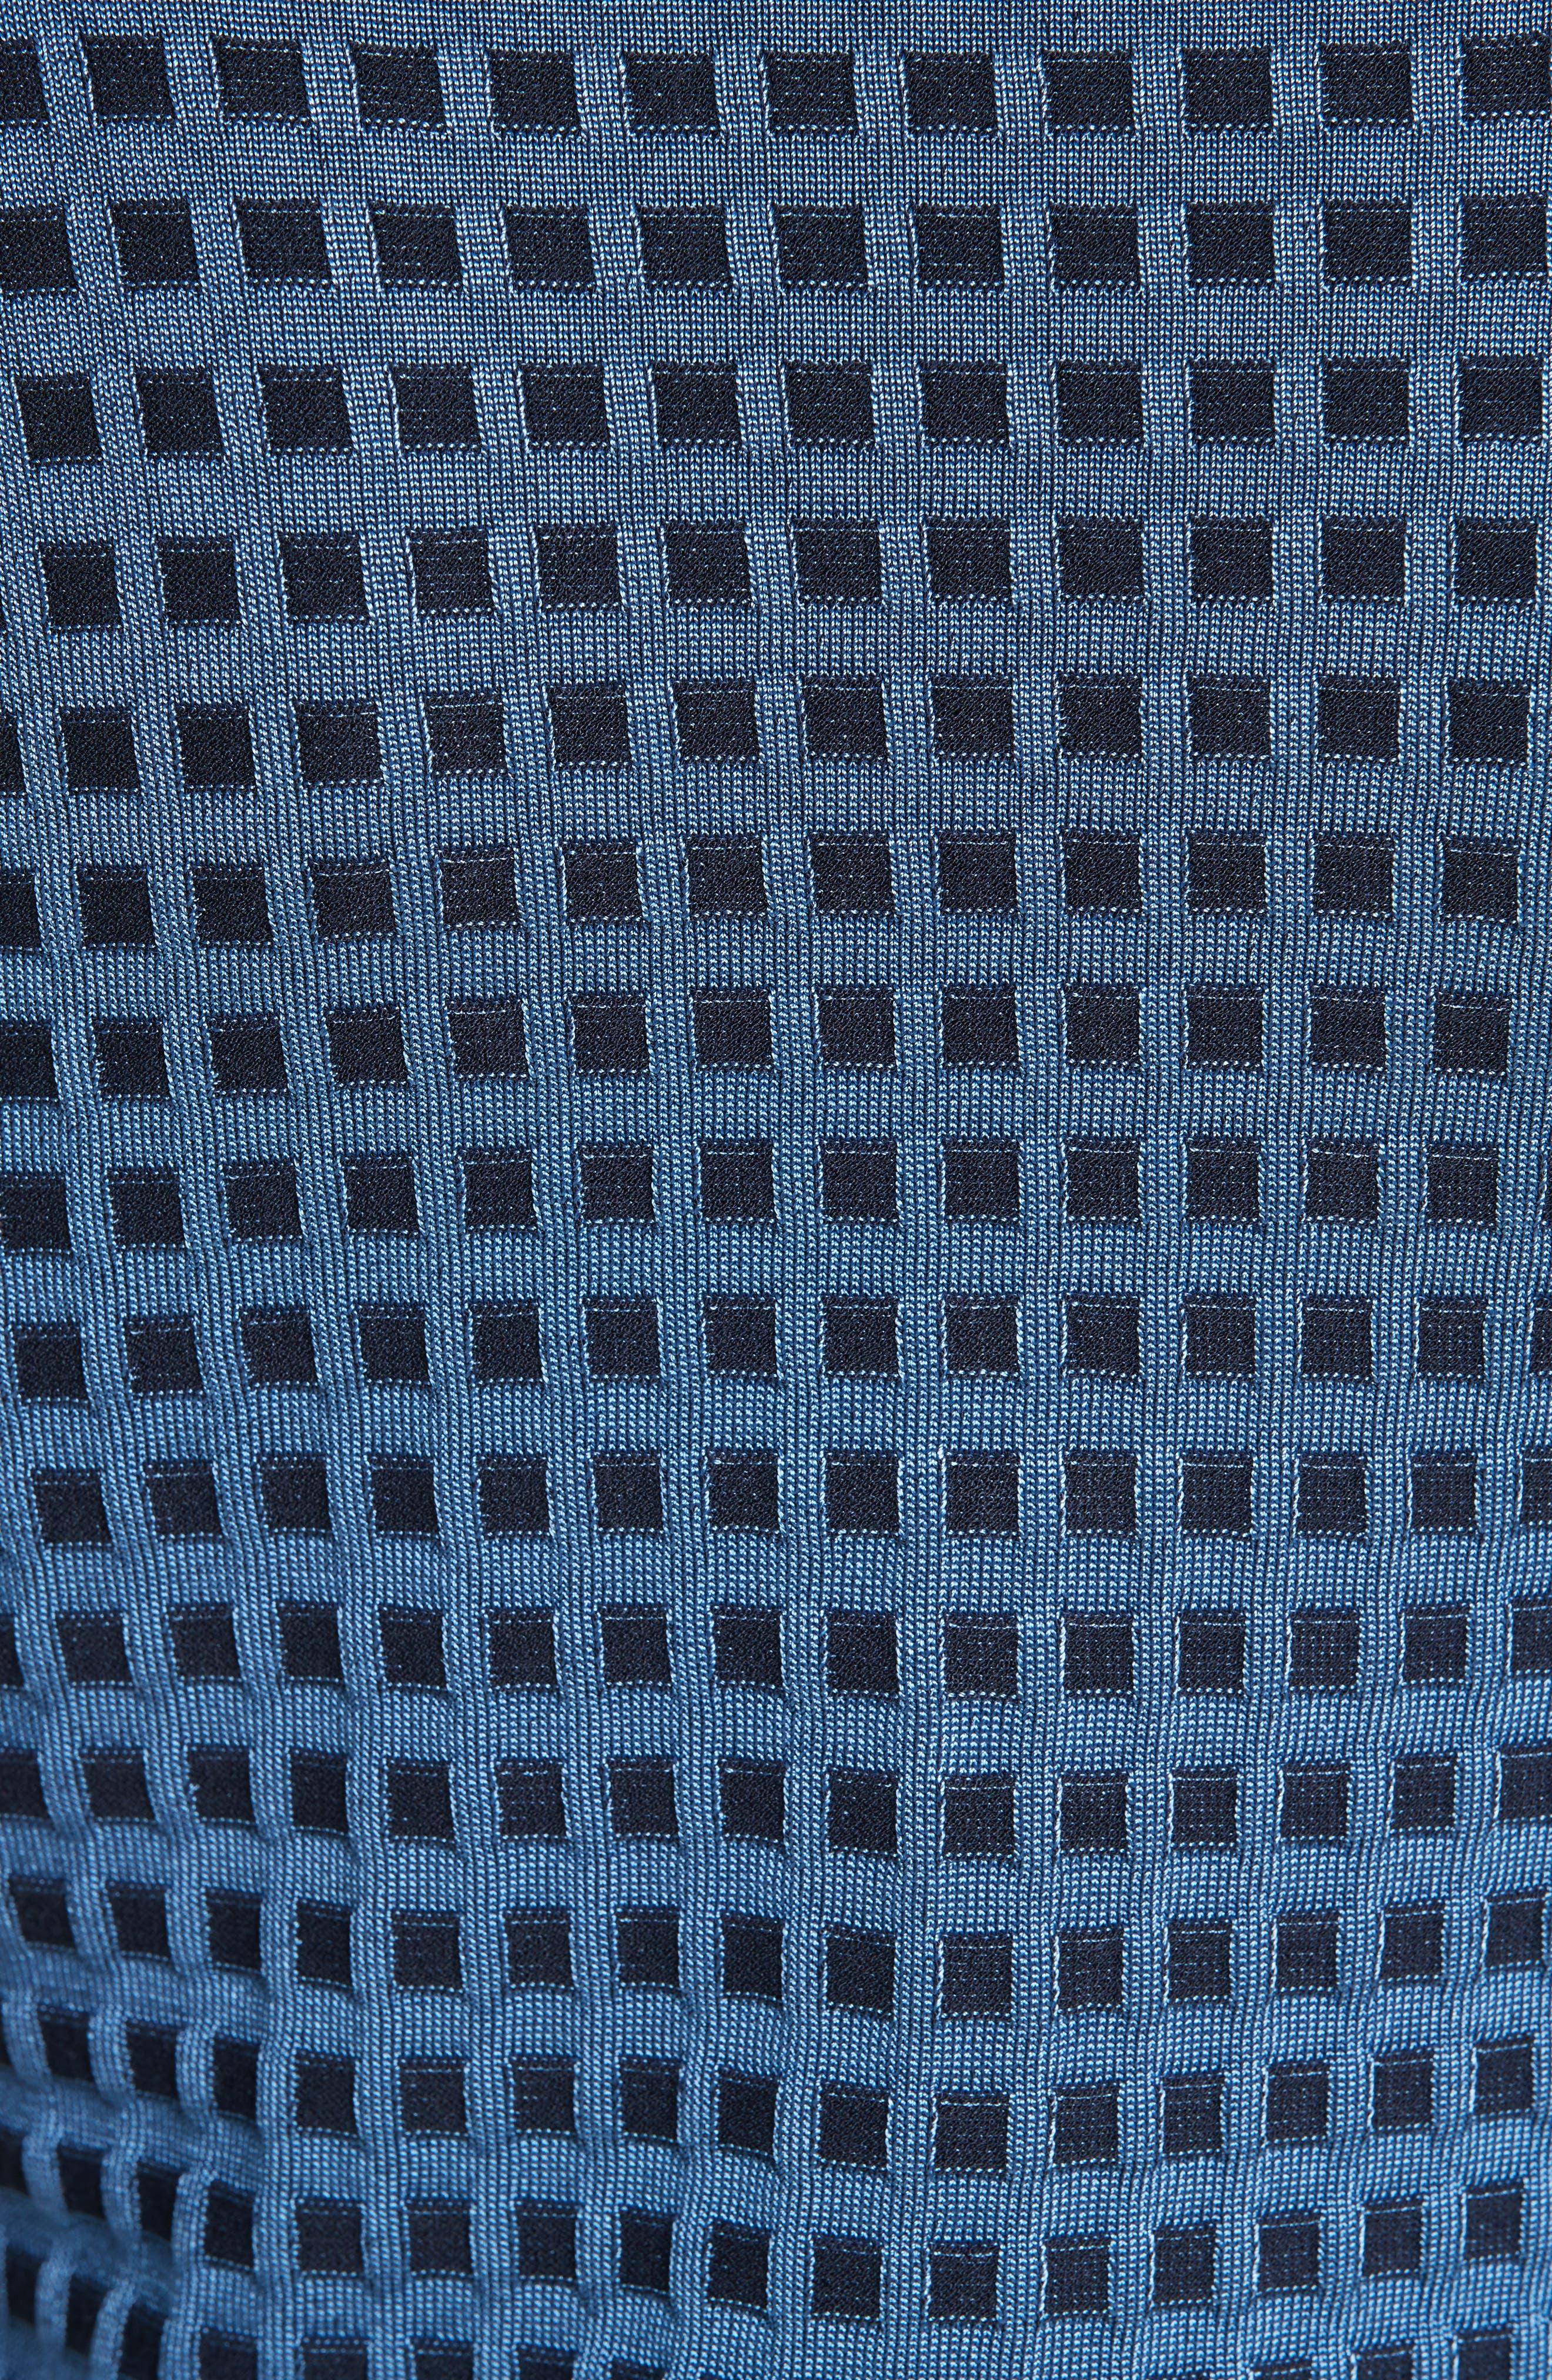 Banded V-Neck Sweater,                             Alternate thumbnail 5, color,                             Denim/ Navy/ Powder